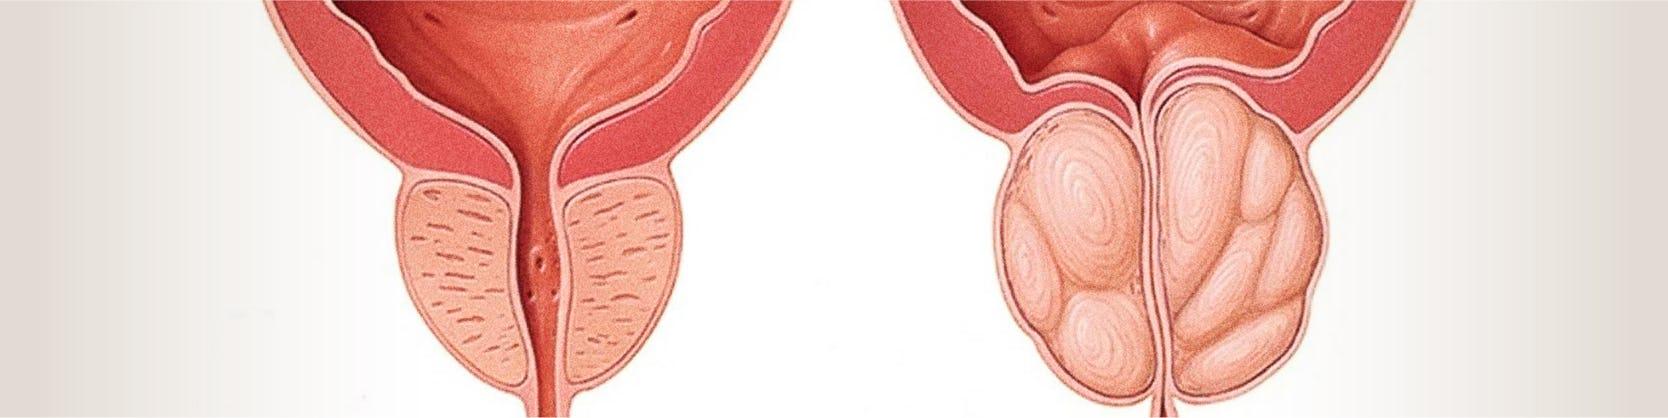 Embolizarea de adenom de prostata | Centrele Ares | Gentleman